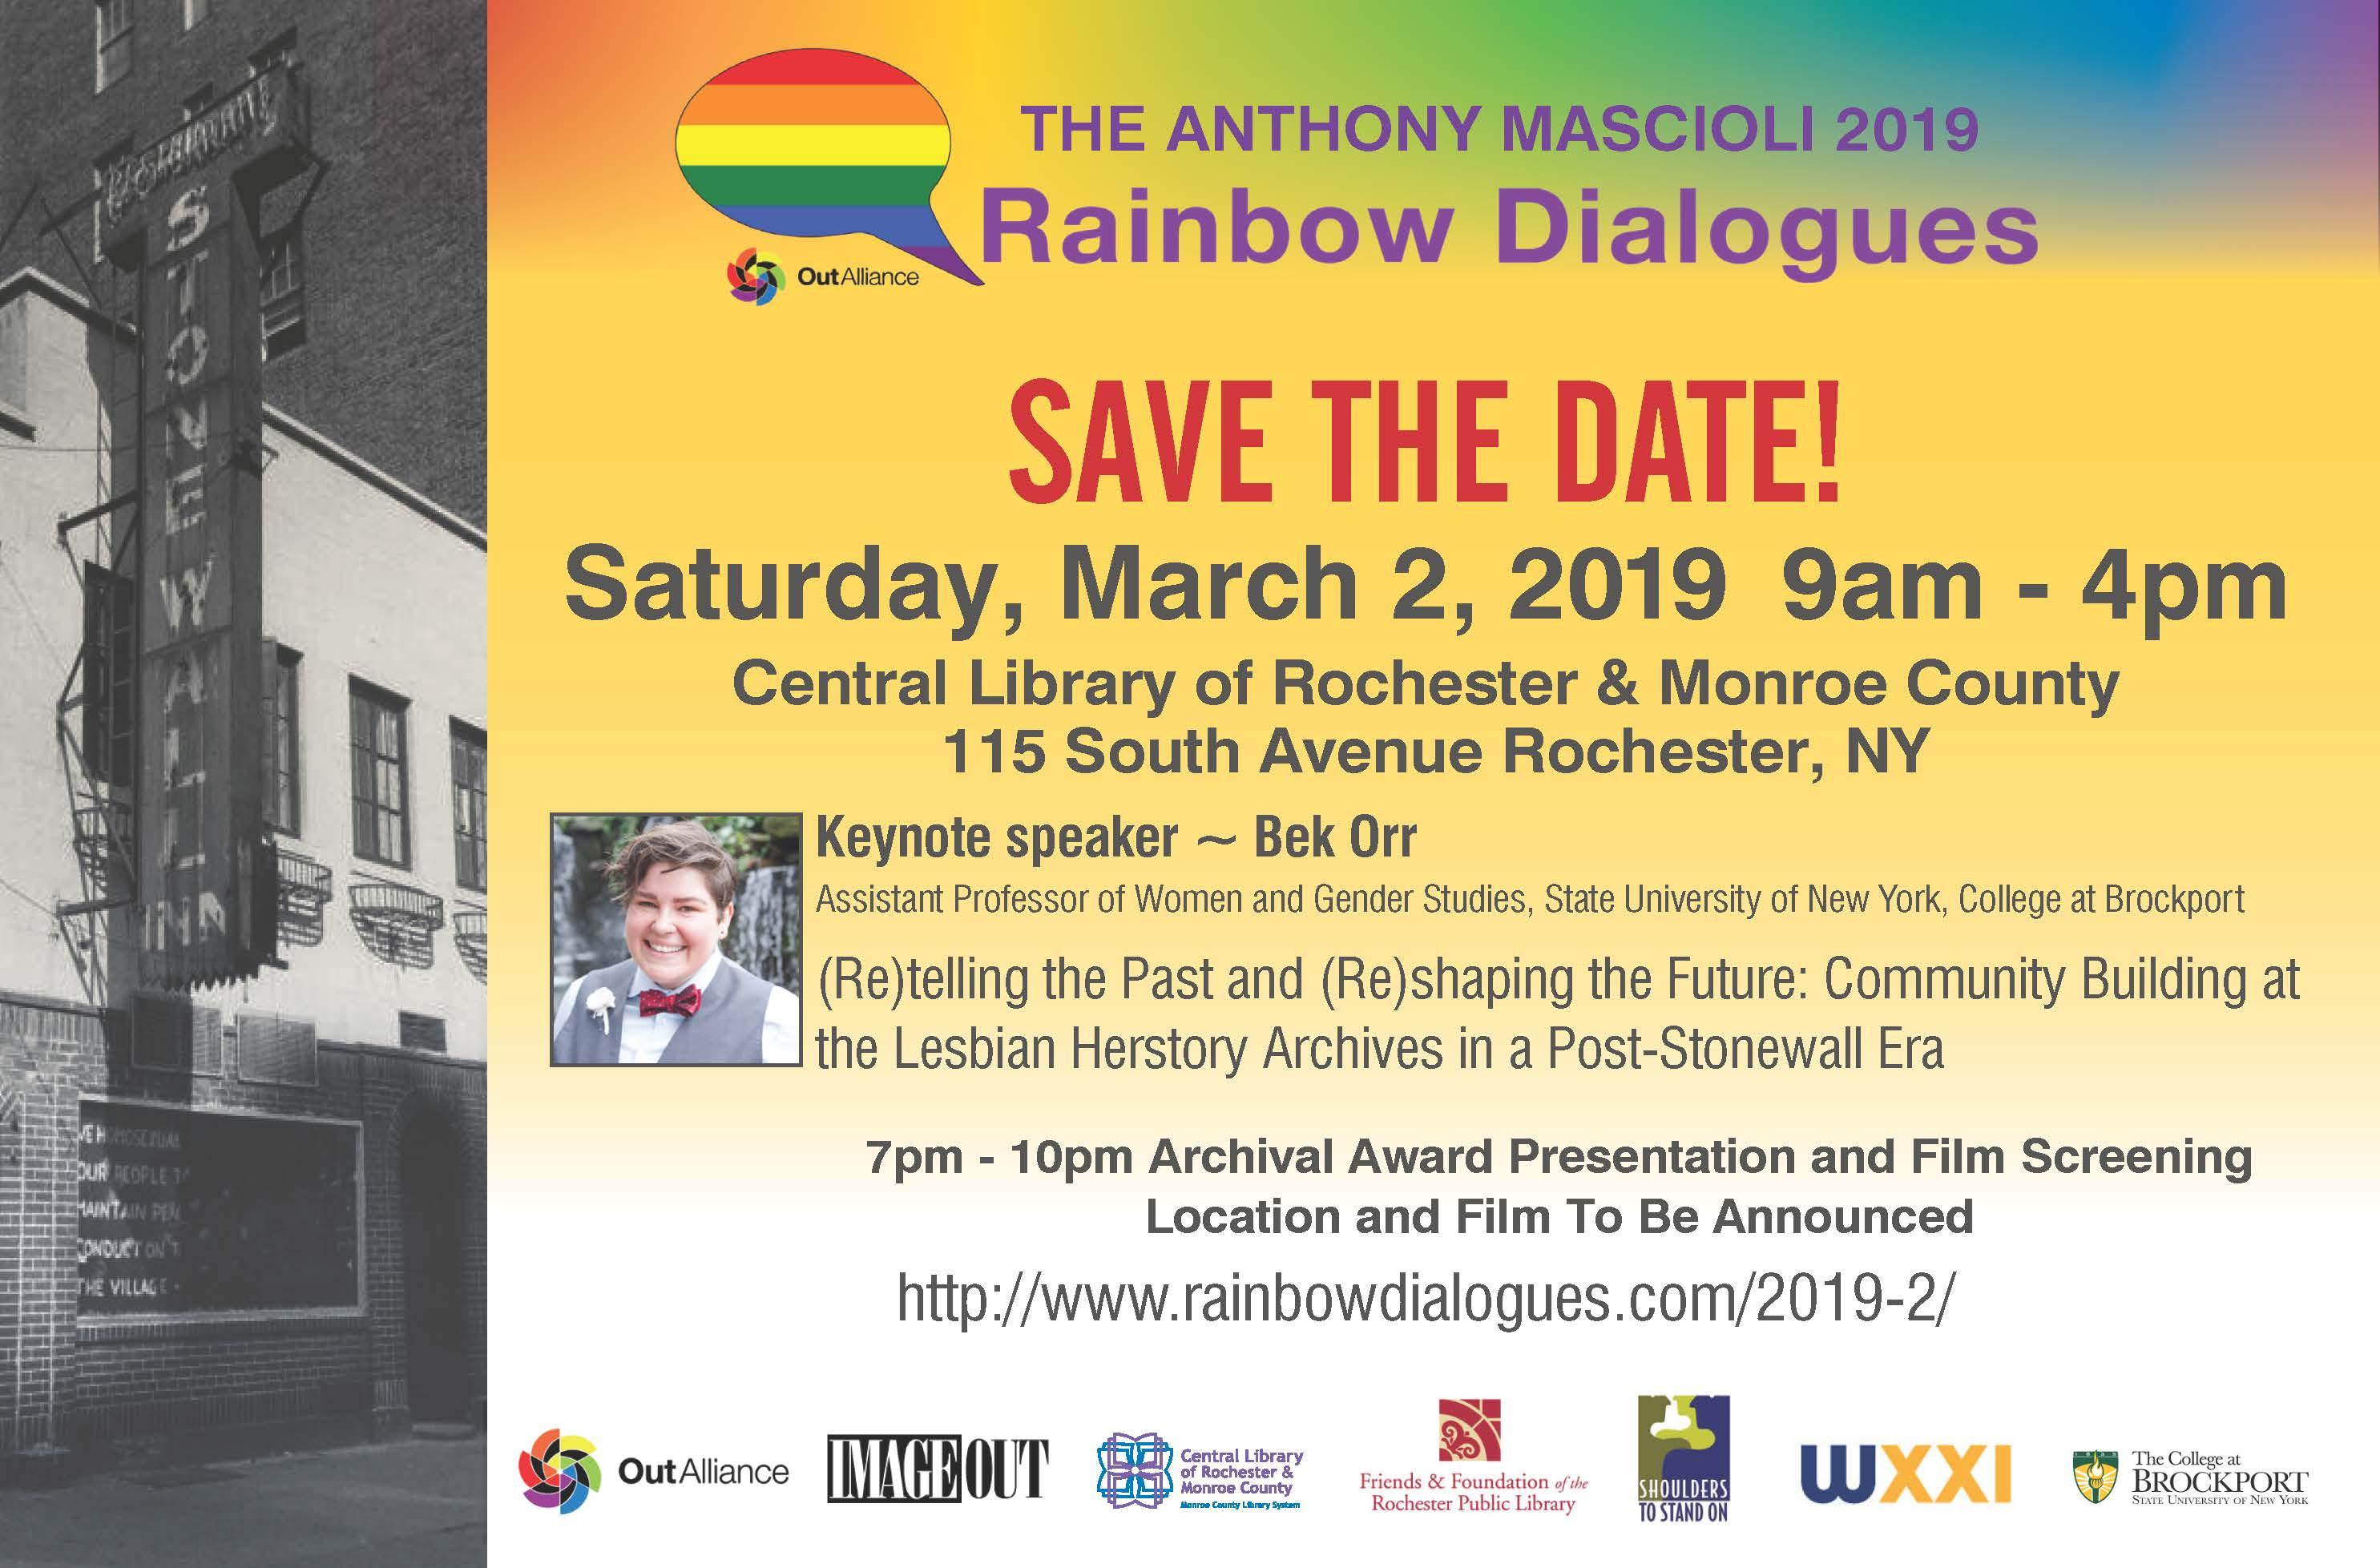 The Anthony Mascioli 2019 Rainbow Dialogues